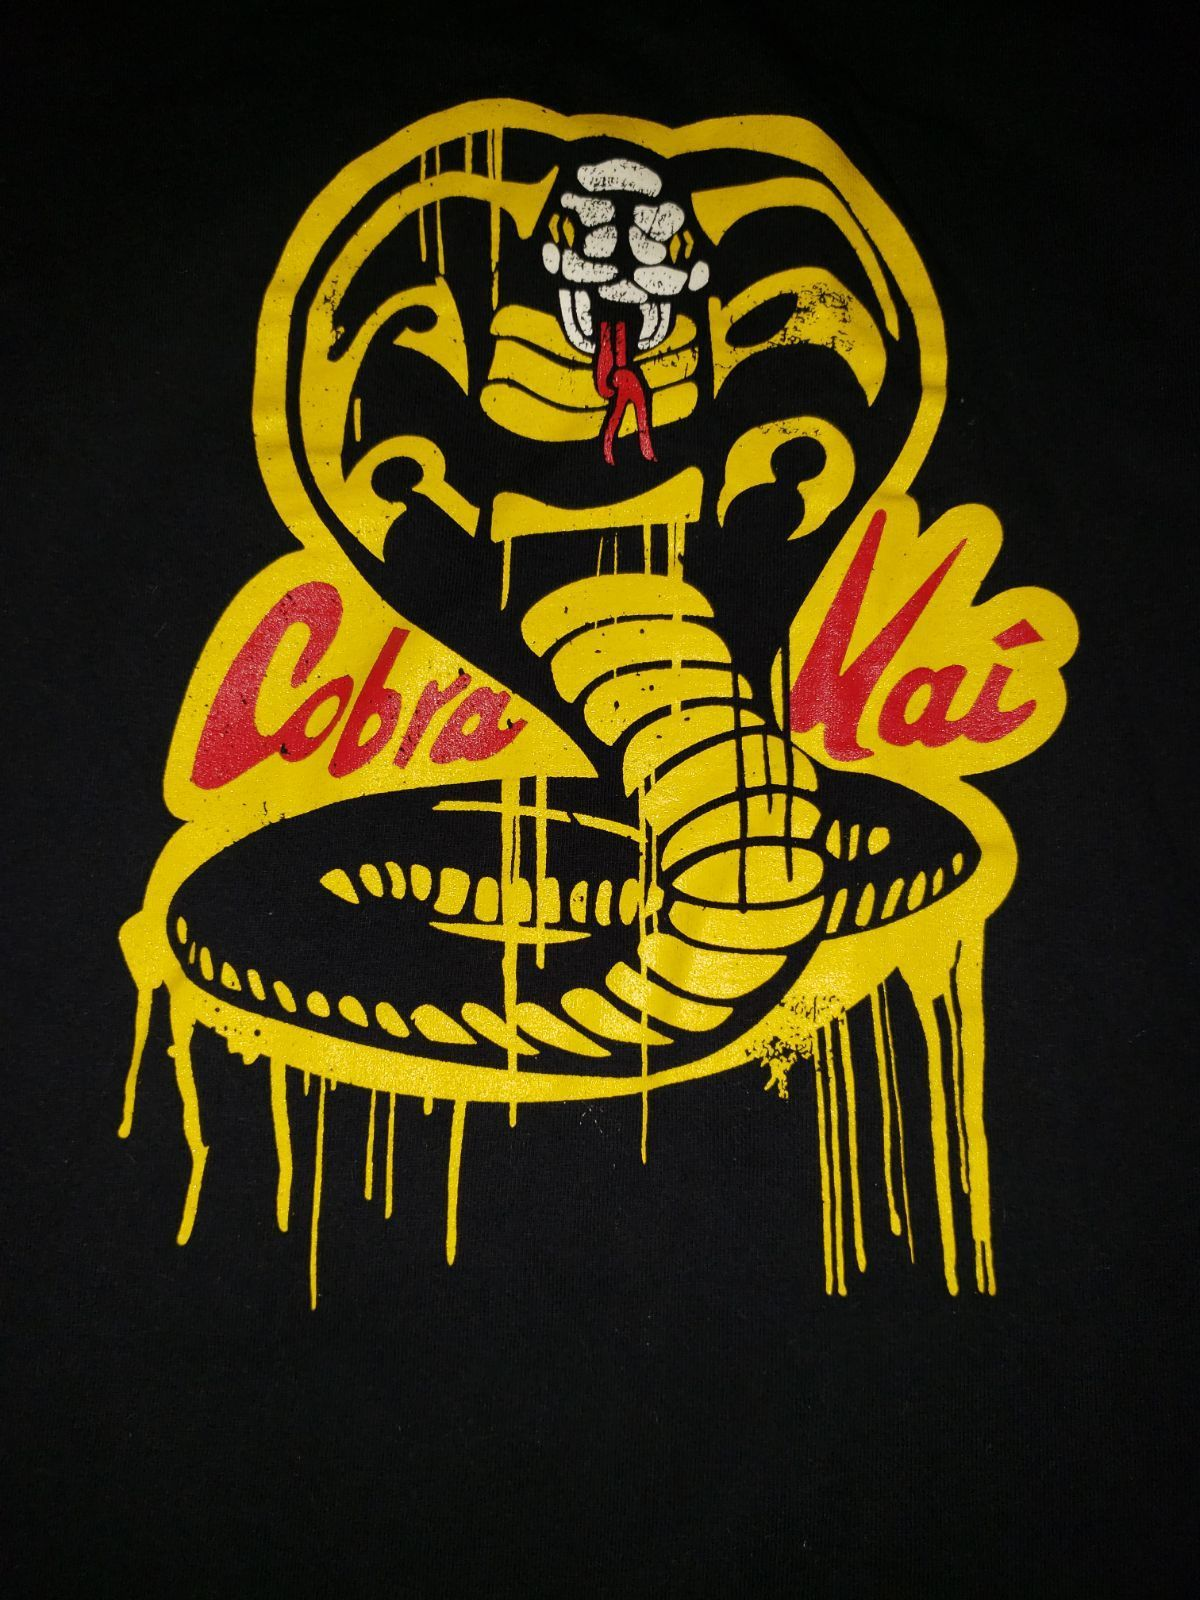 Cobra Kai Snake Wallpapers - Wallpaper Cave